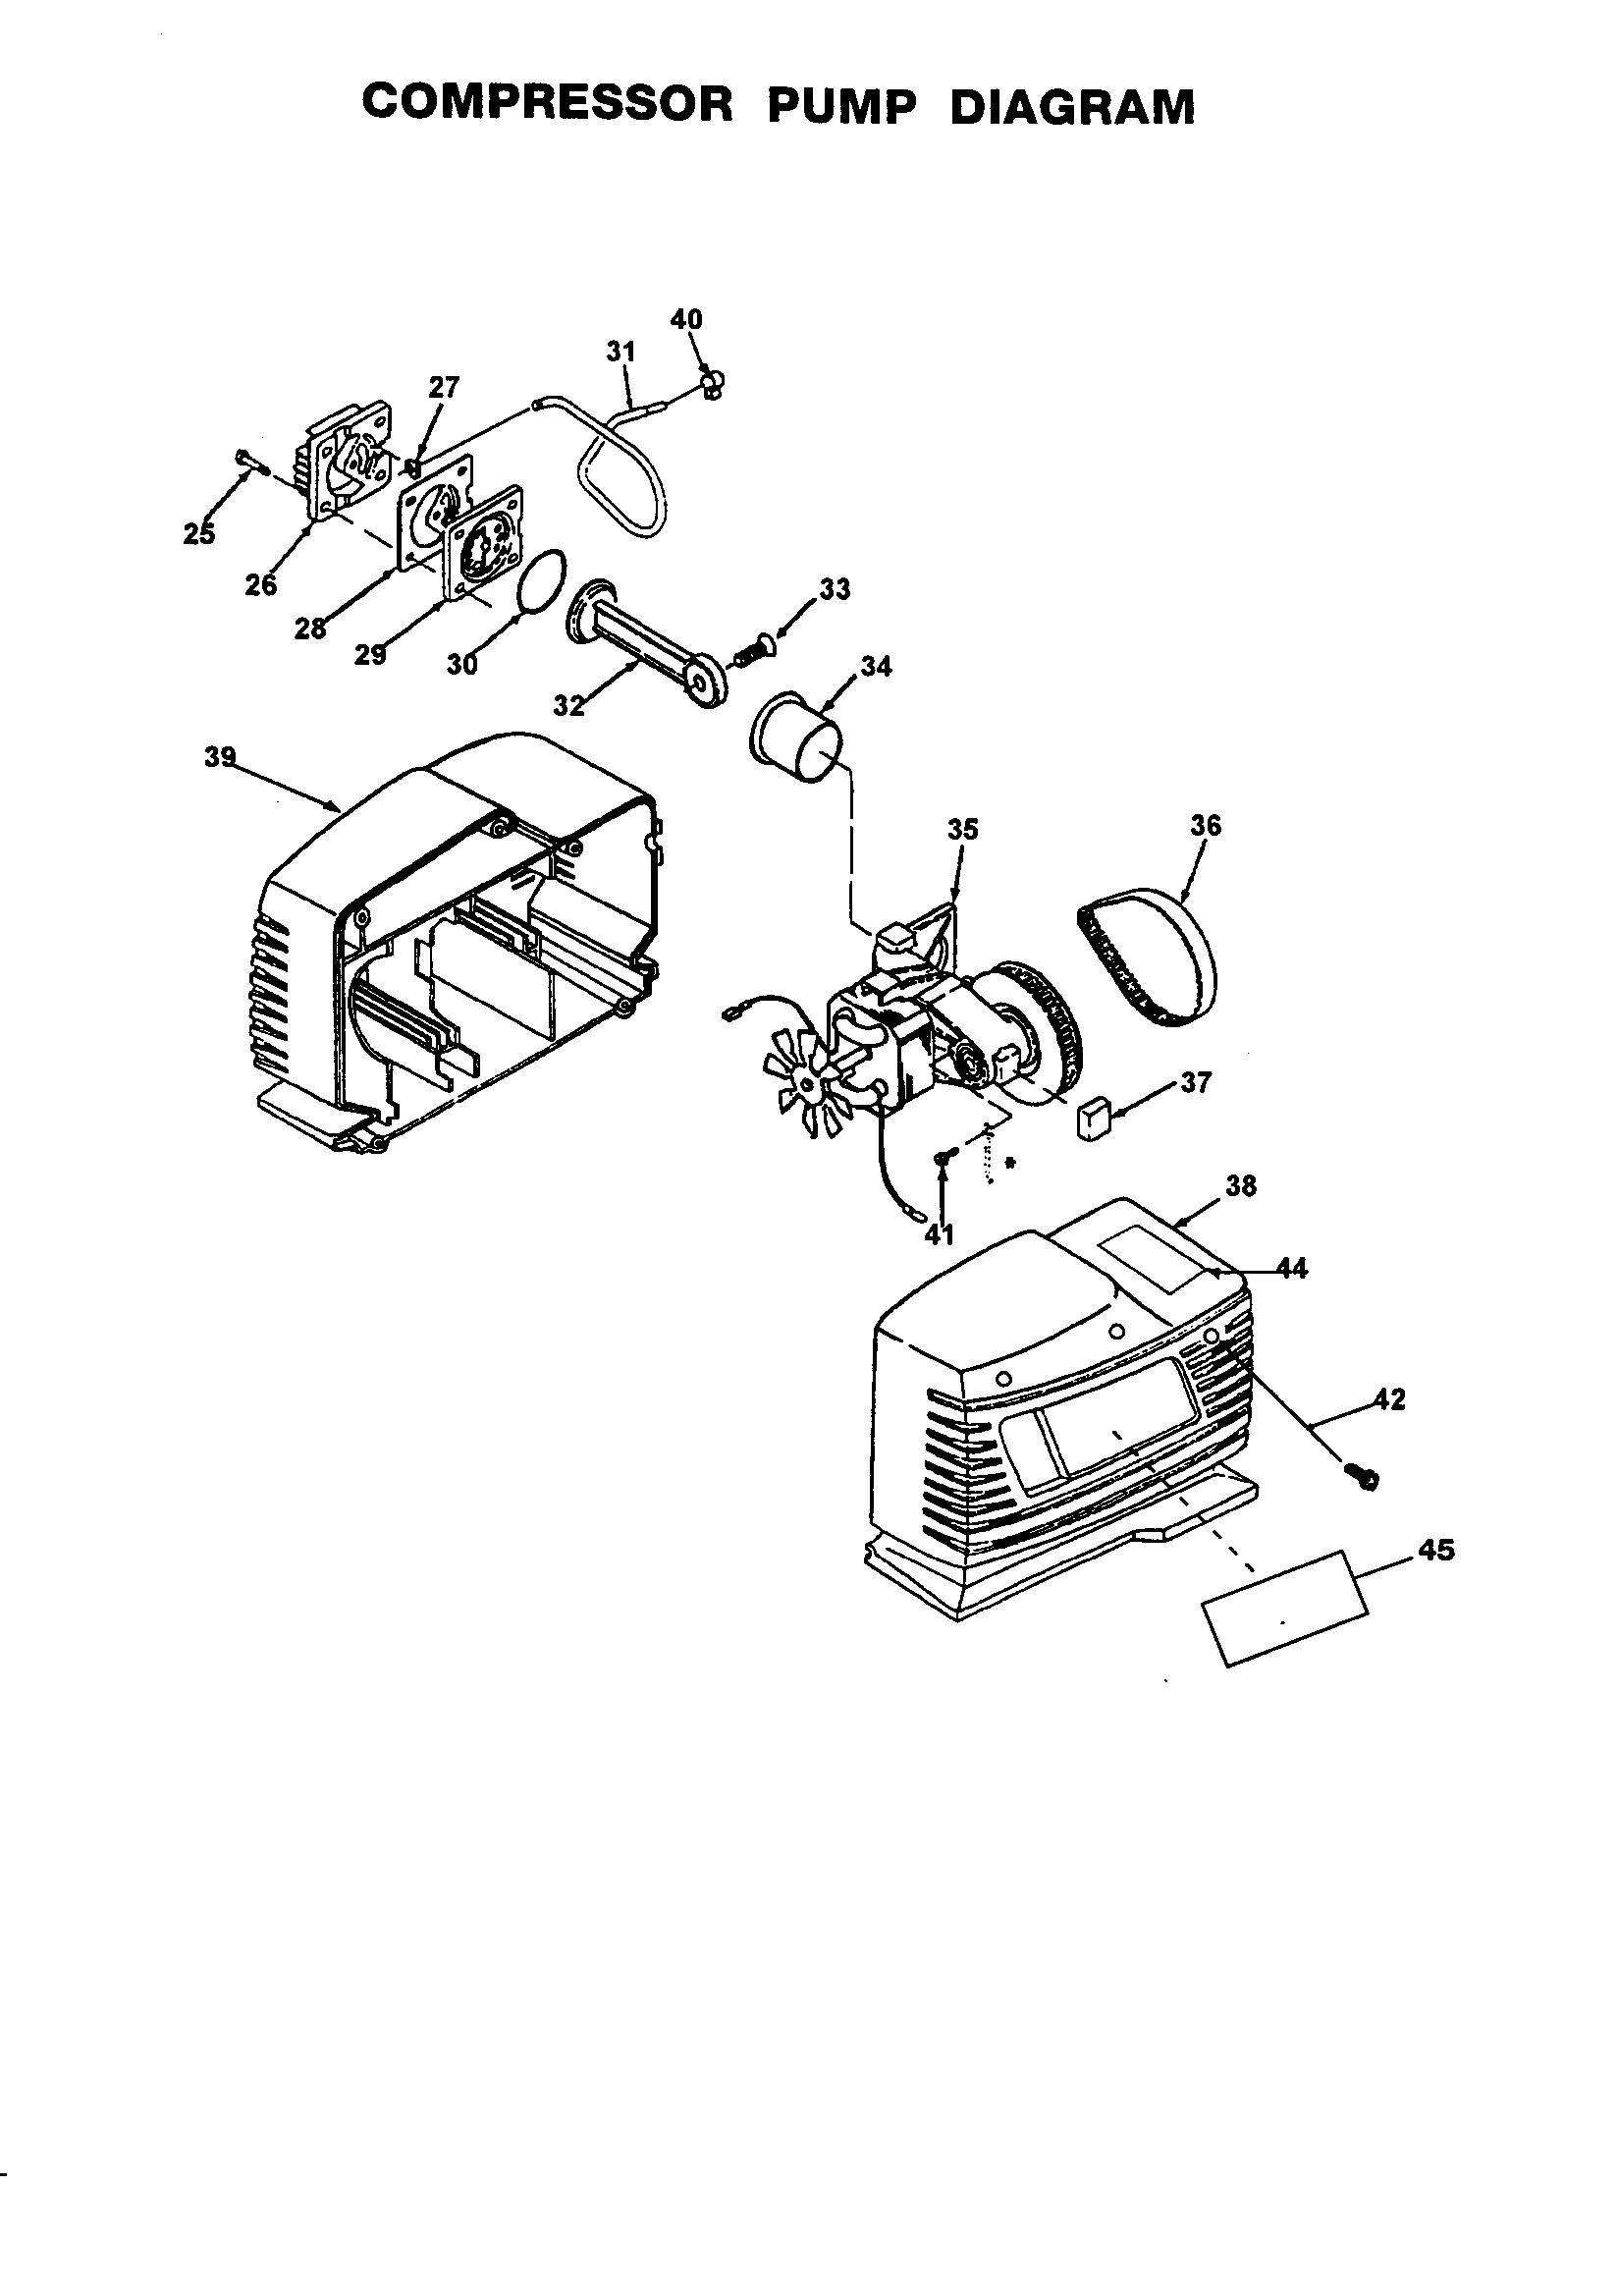 Craftsman model 919162121 air compressor genuine parts